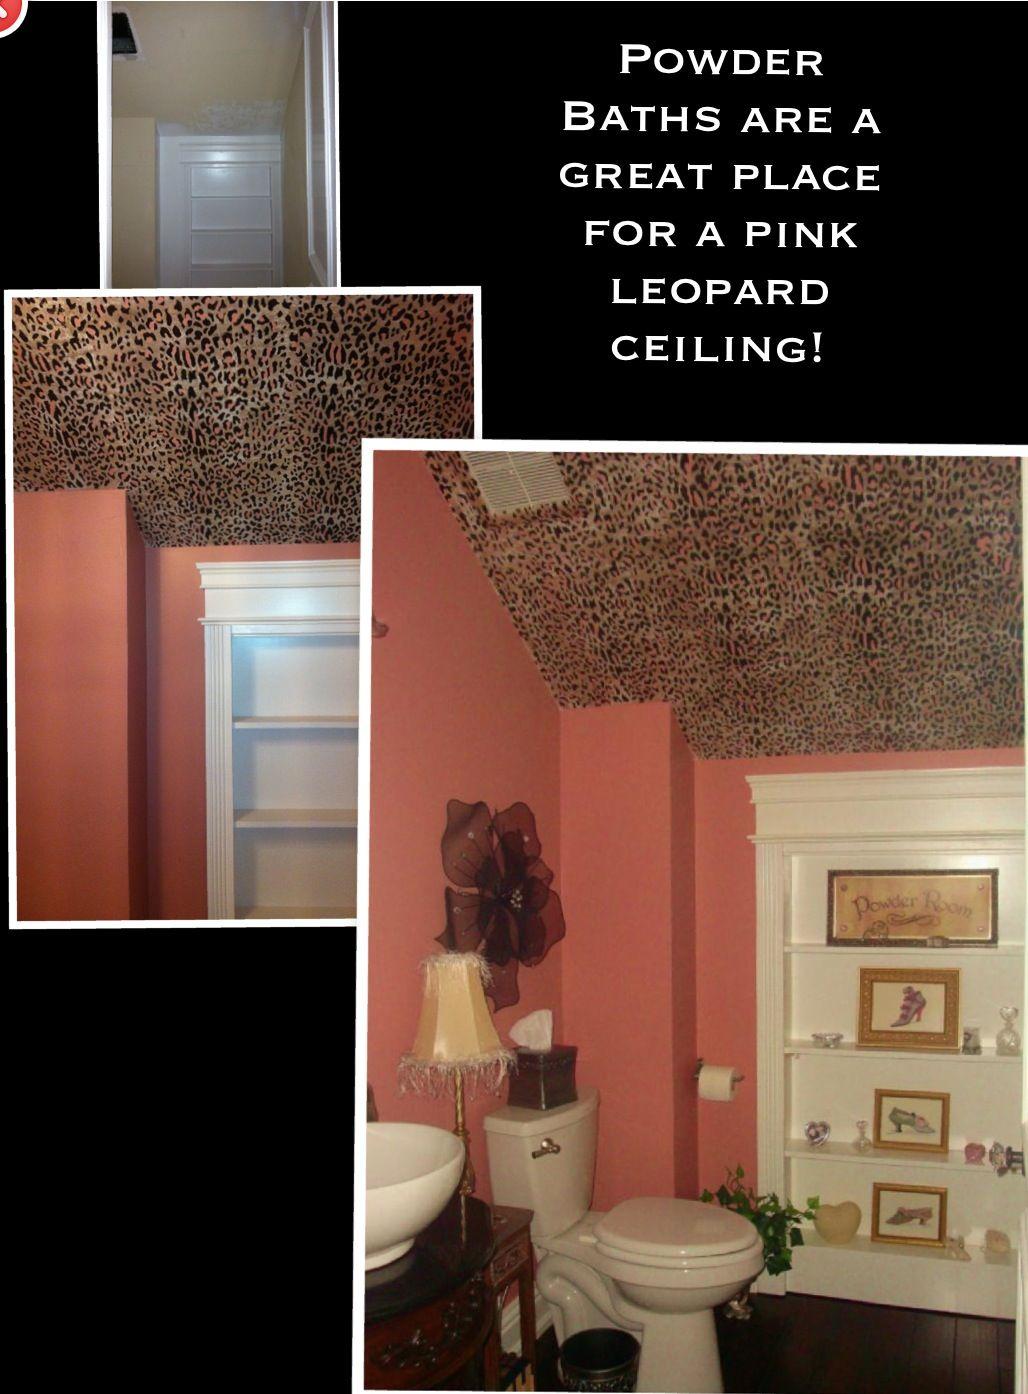 Pink Leopard Ceiling